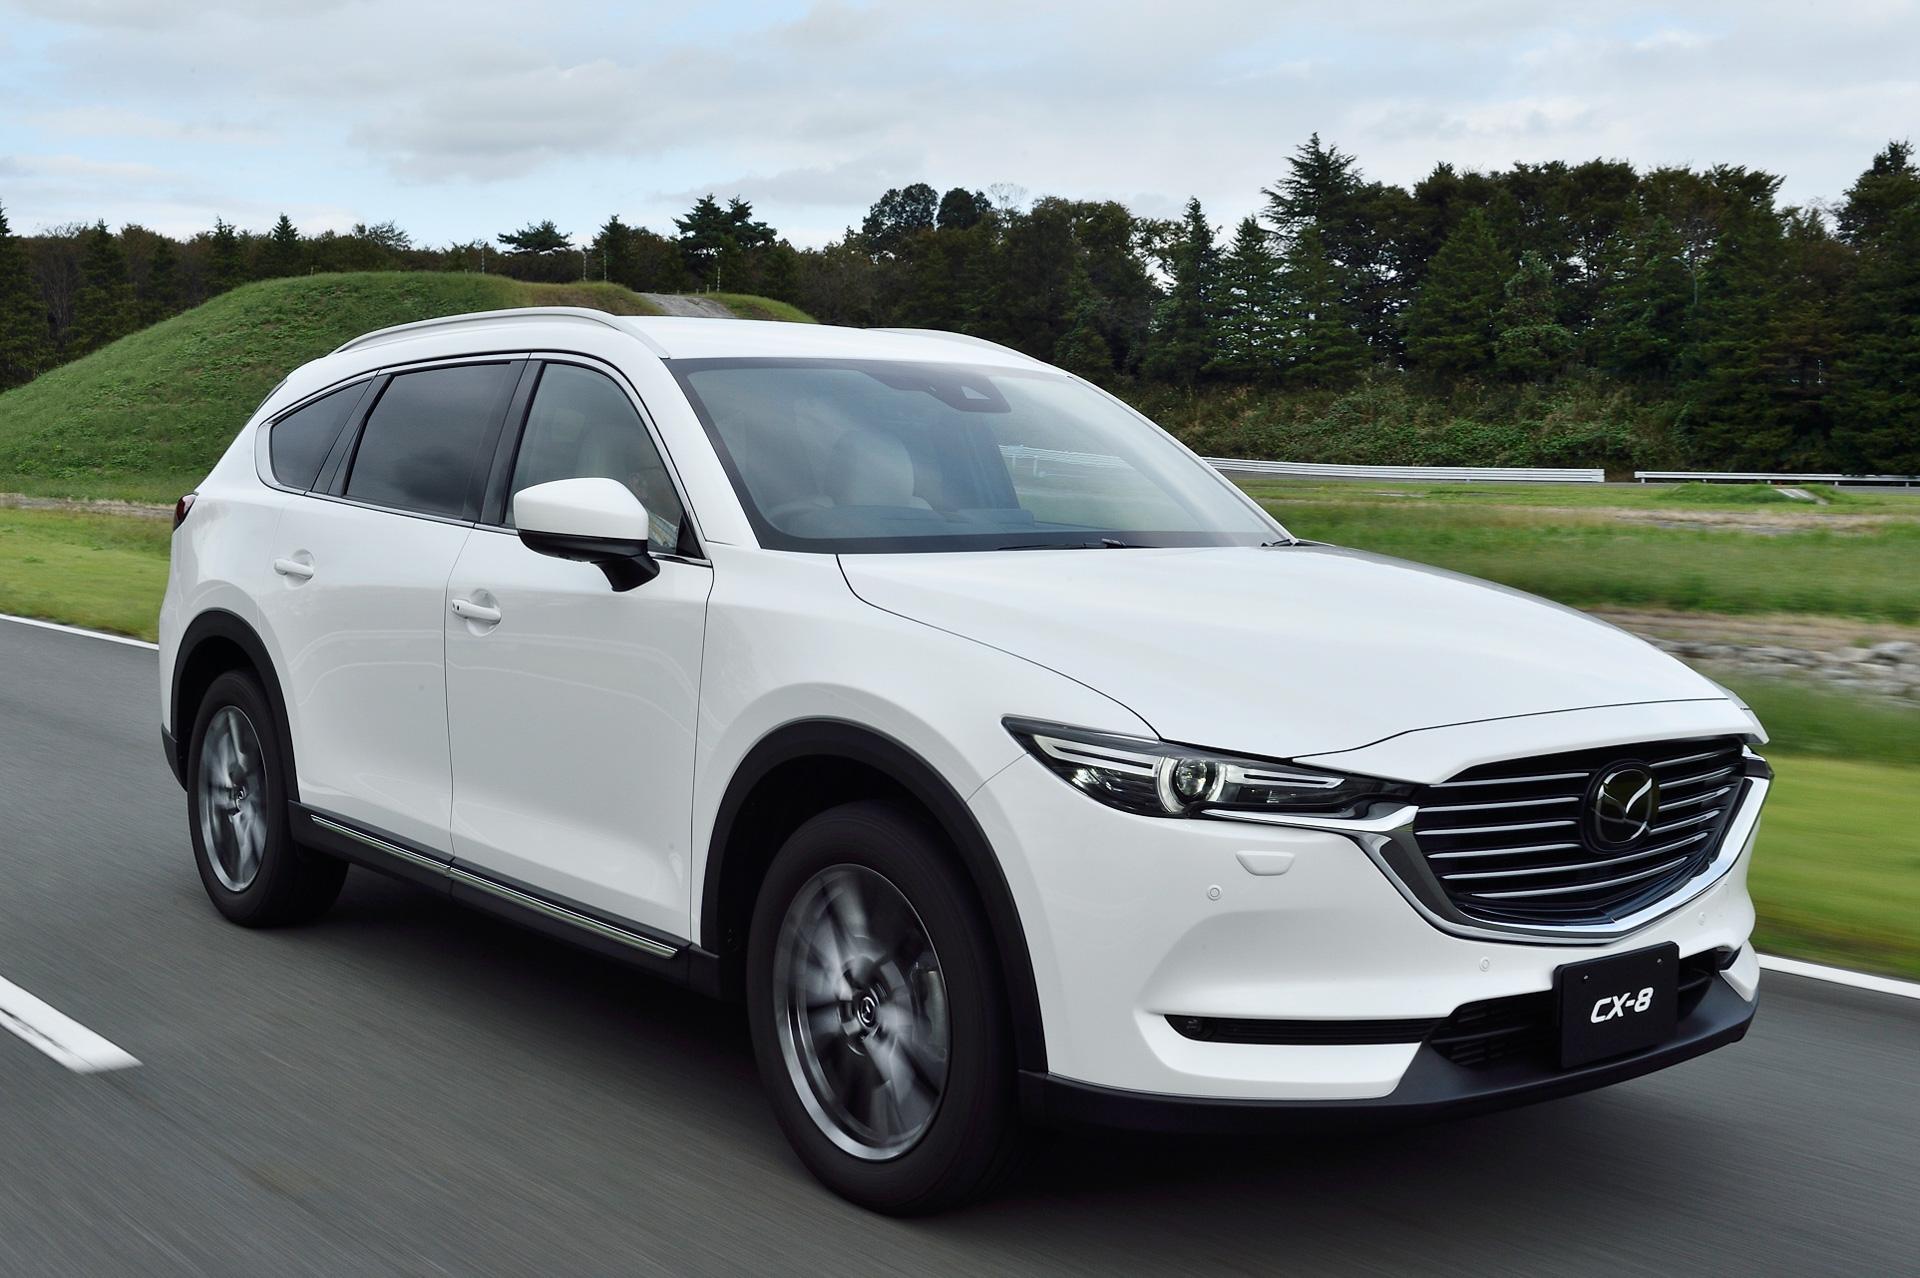 What Is Skyactiv Mazda >> 【試乗インプレ】マツダ「CX-8」商品改良。ガソリンモデル「SKYACTIV-G 2.5T」「SKYACTIV-G ...